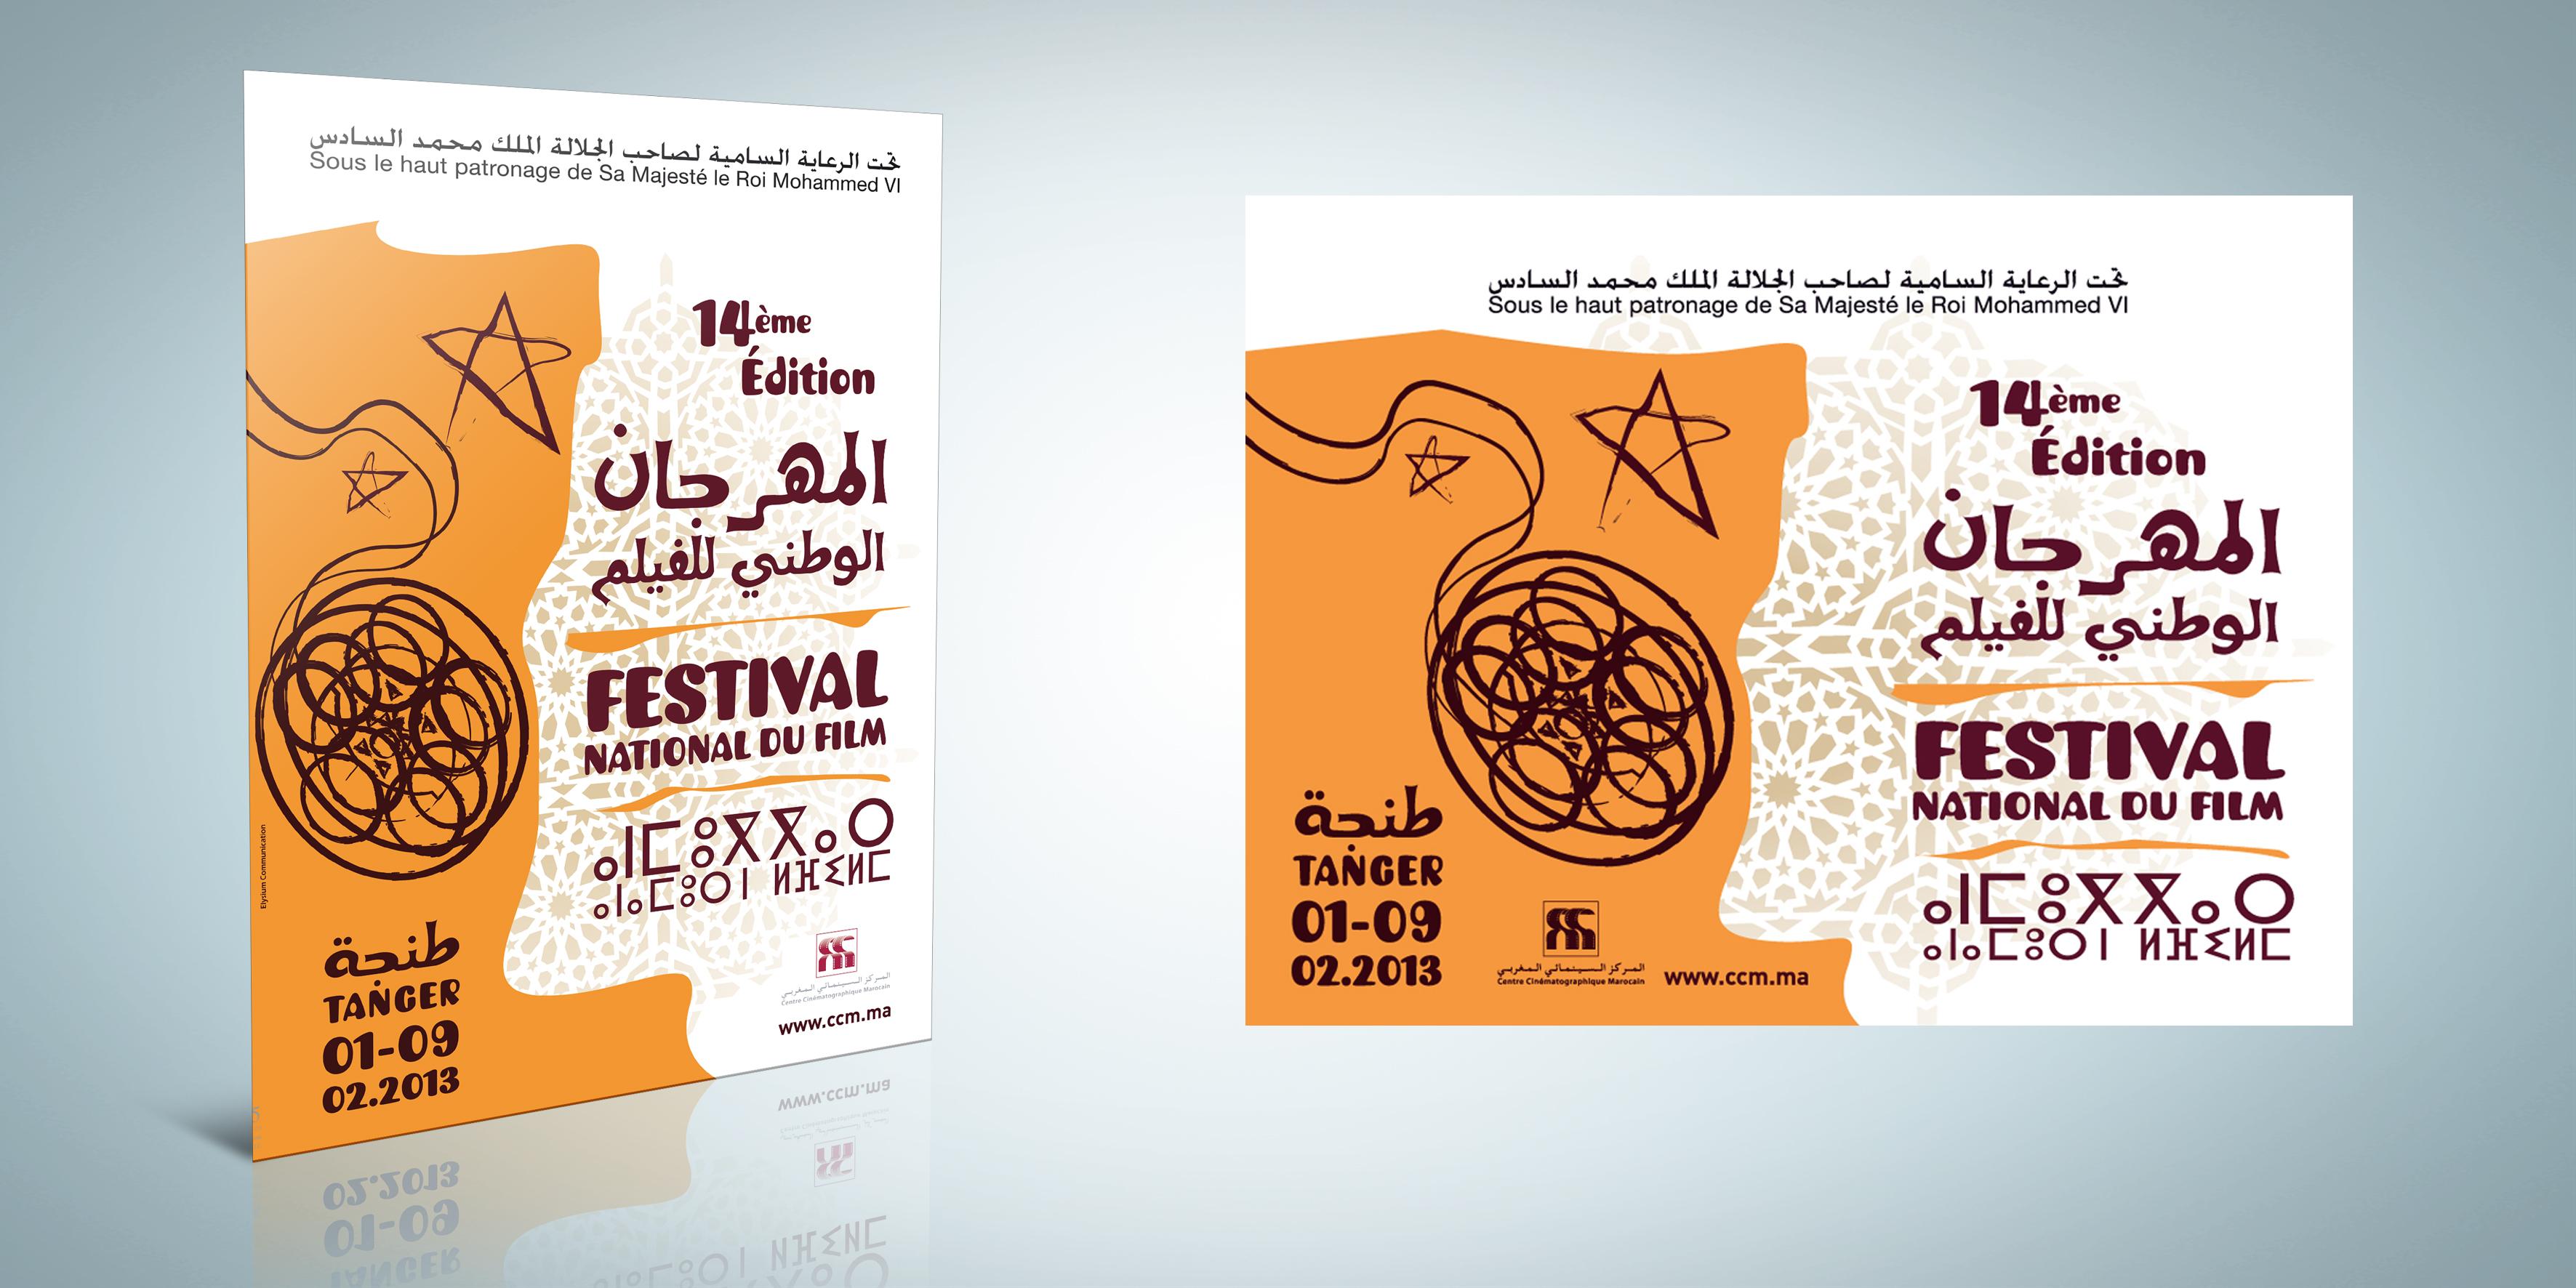 Visuel officiel du Festival National du film Tanger Maroc